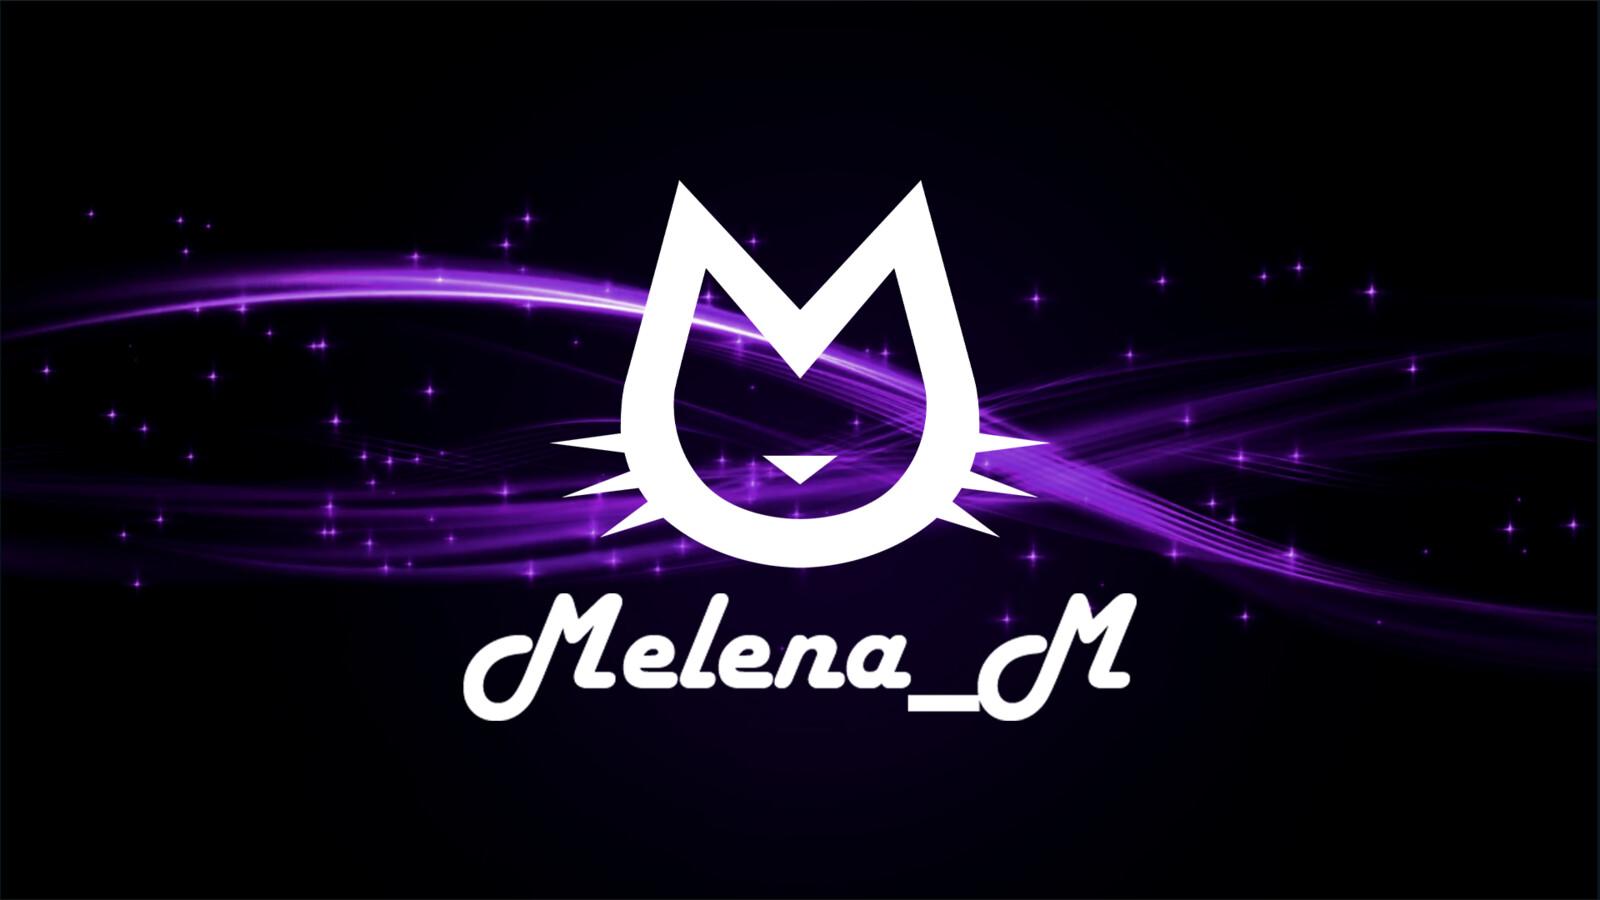 Melena_M 2.0